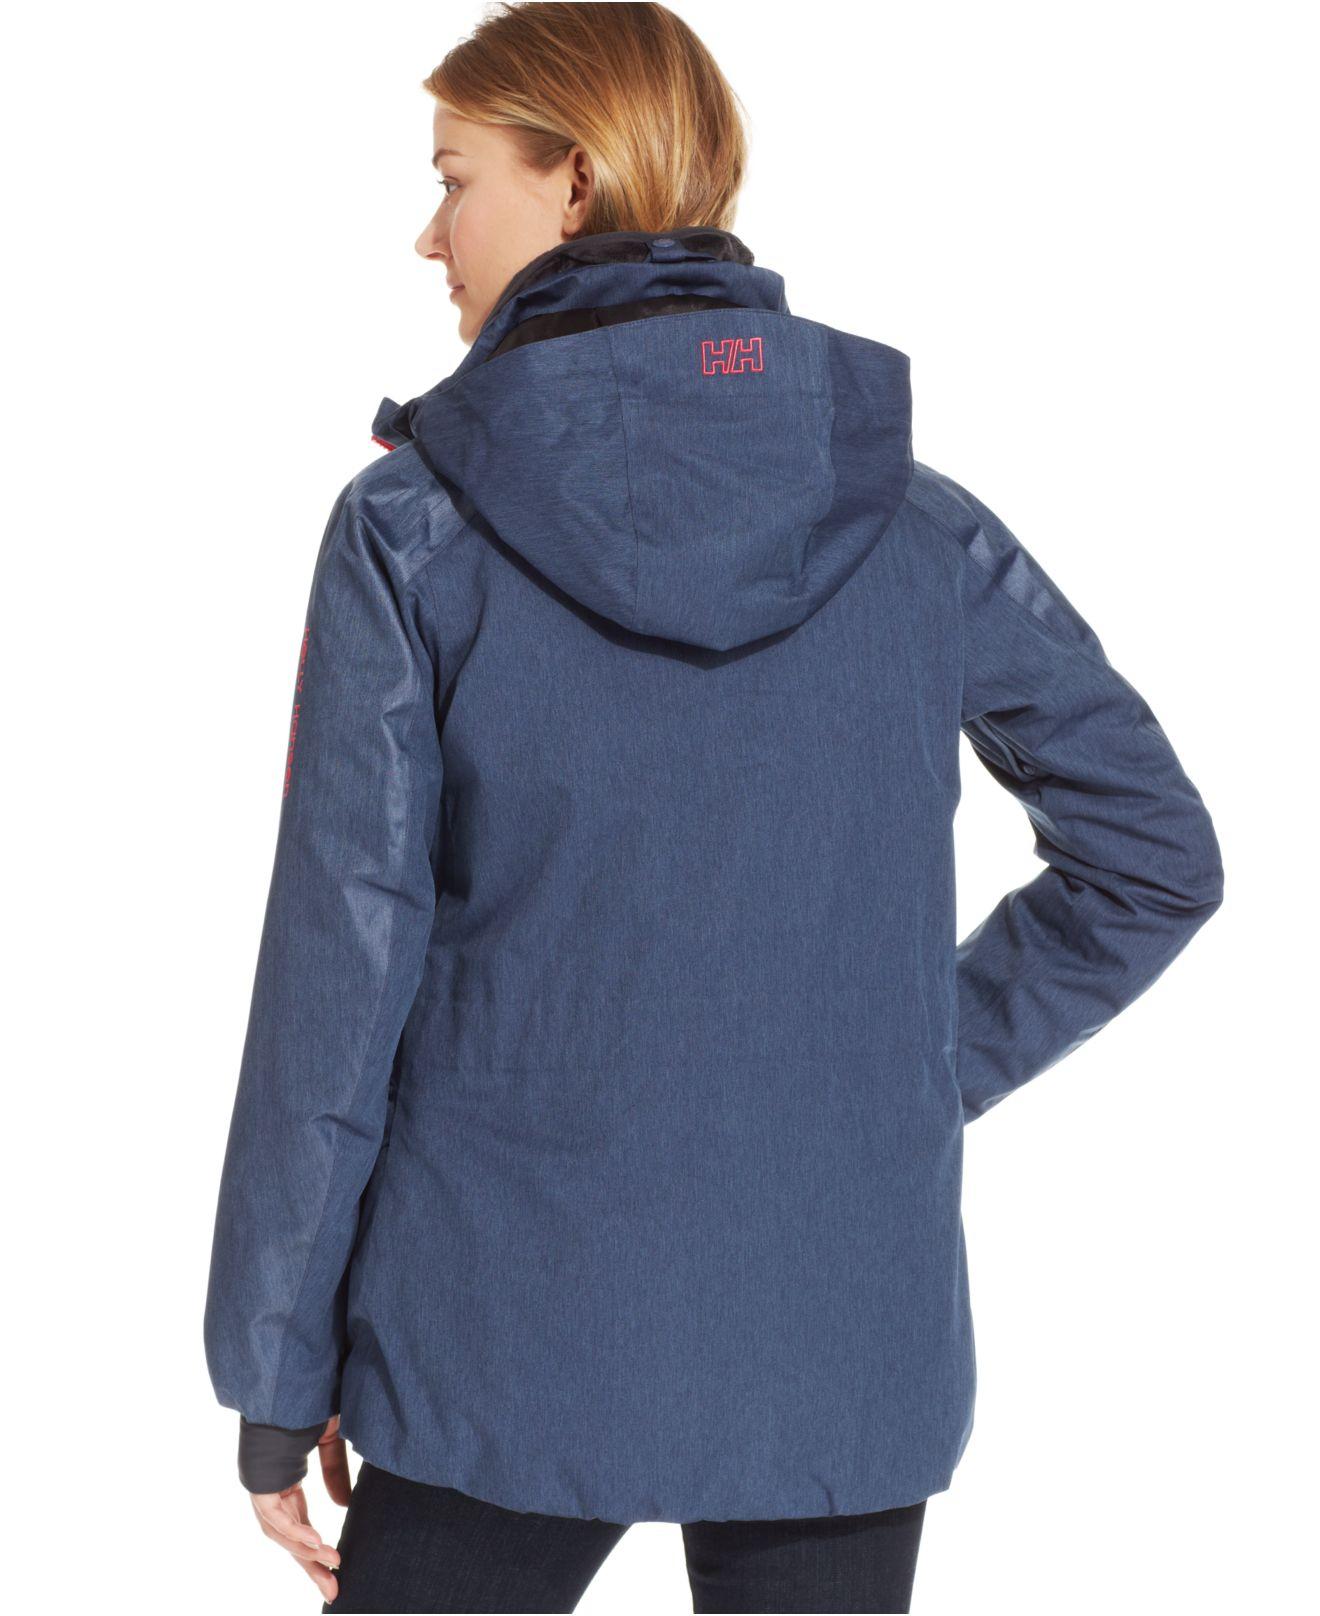 helly hansen blanche hooded ski jacket in blue lyst. Black Bedroom Furniture Sets. Home Design Ideas